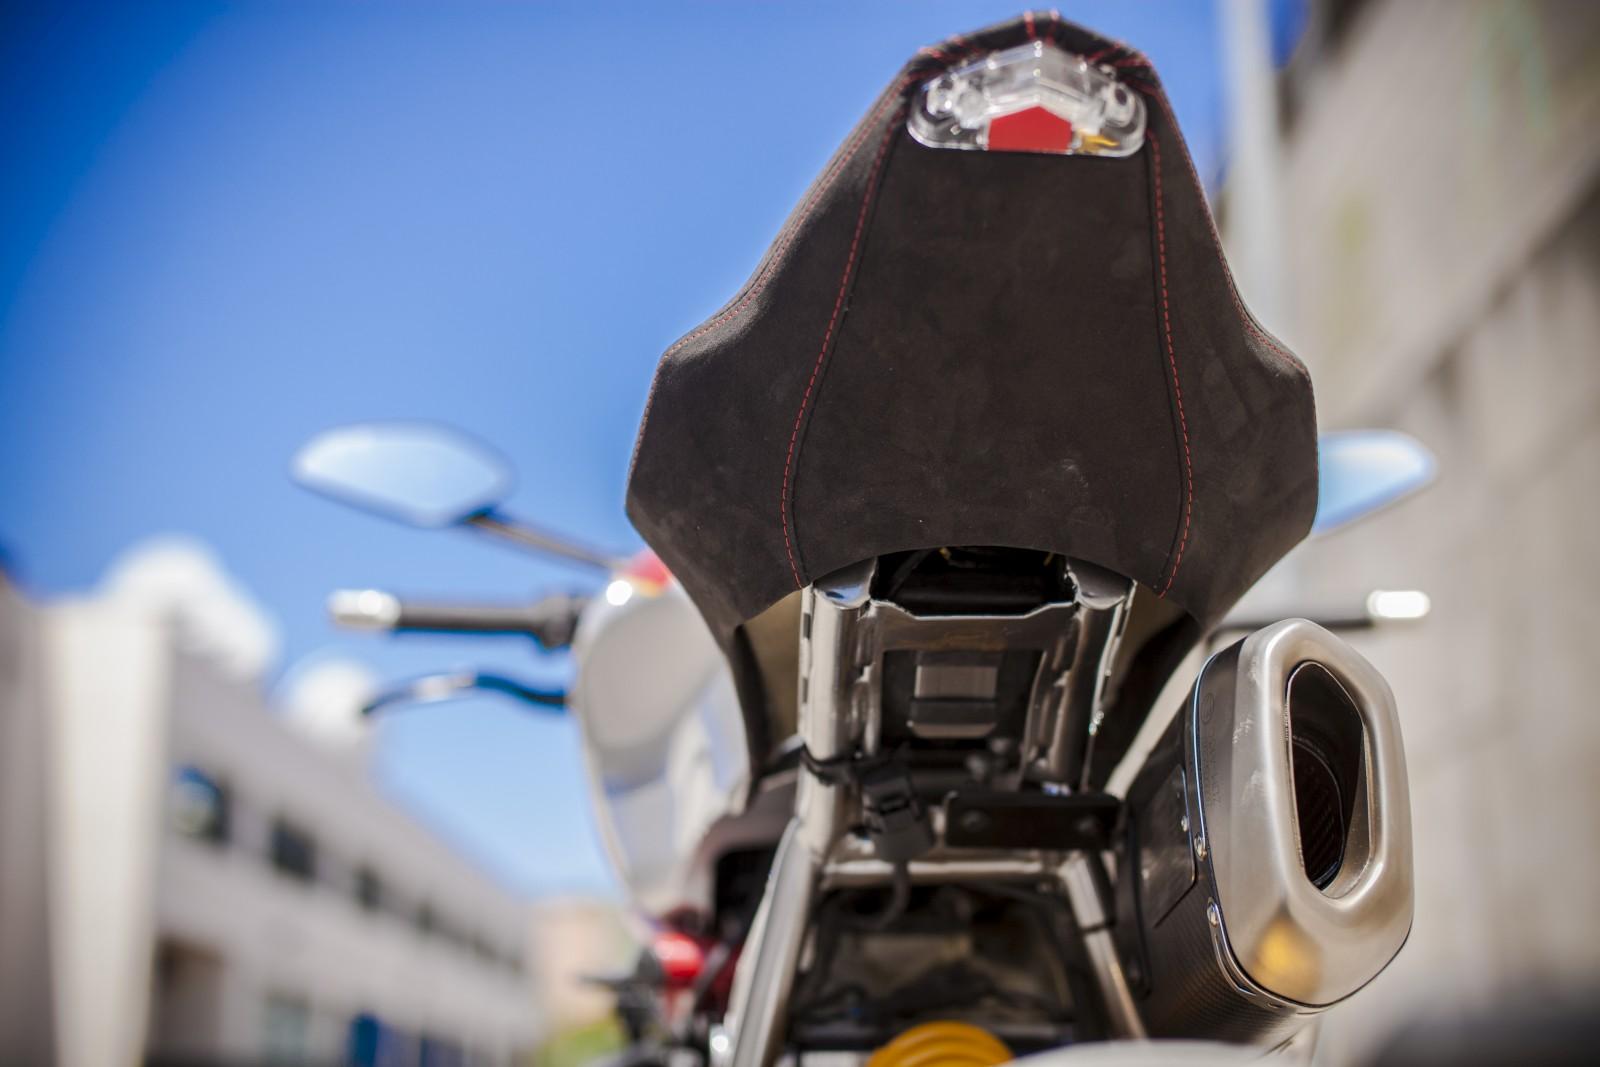 Customised Ducati Monster 1200 - XTR Pepo Siluro (6)